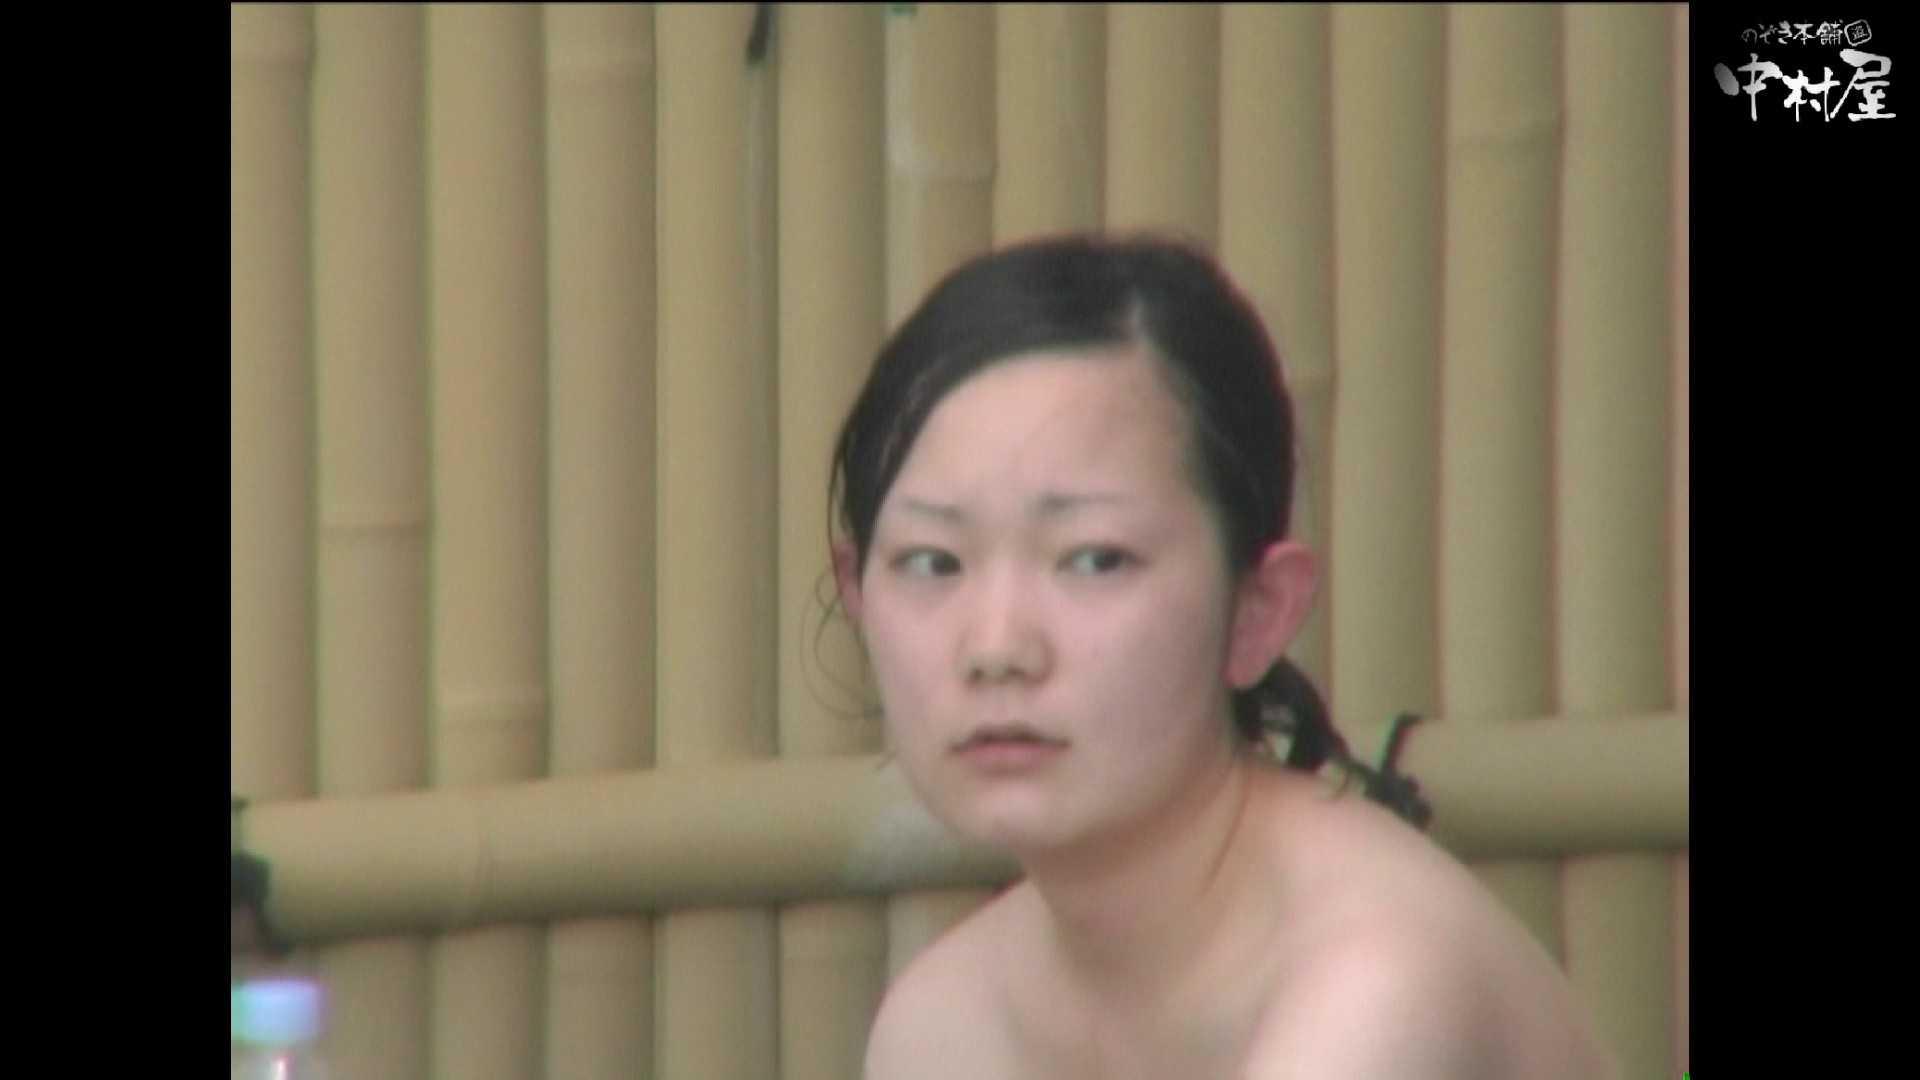 Aquaな露天風呂Vol.892 盗撮 われめAV動画紹介 80画像 38